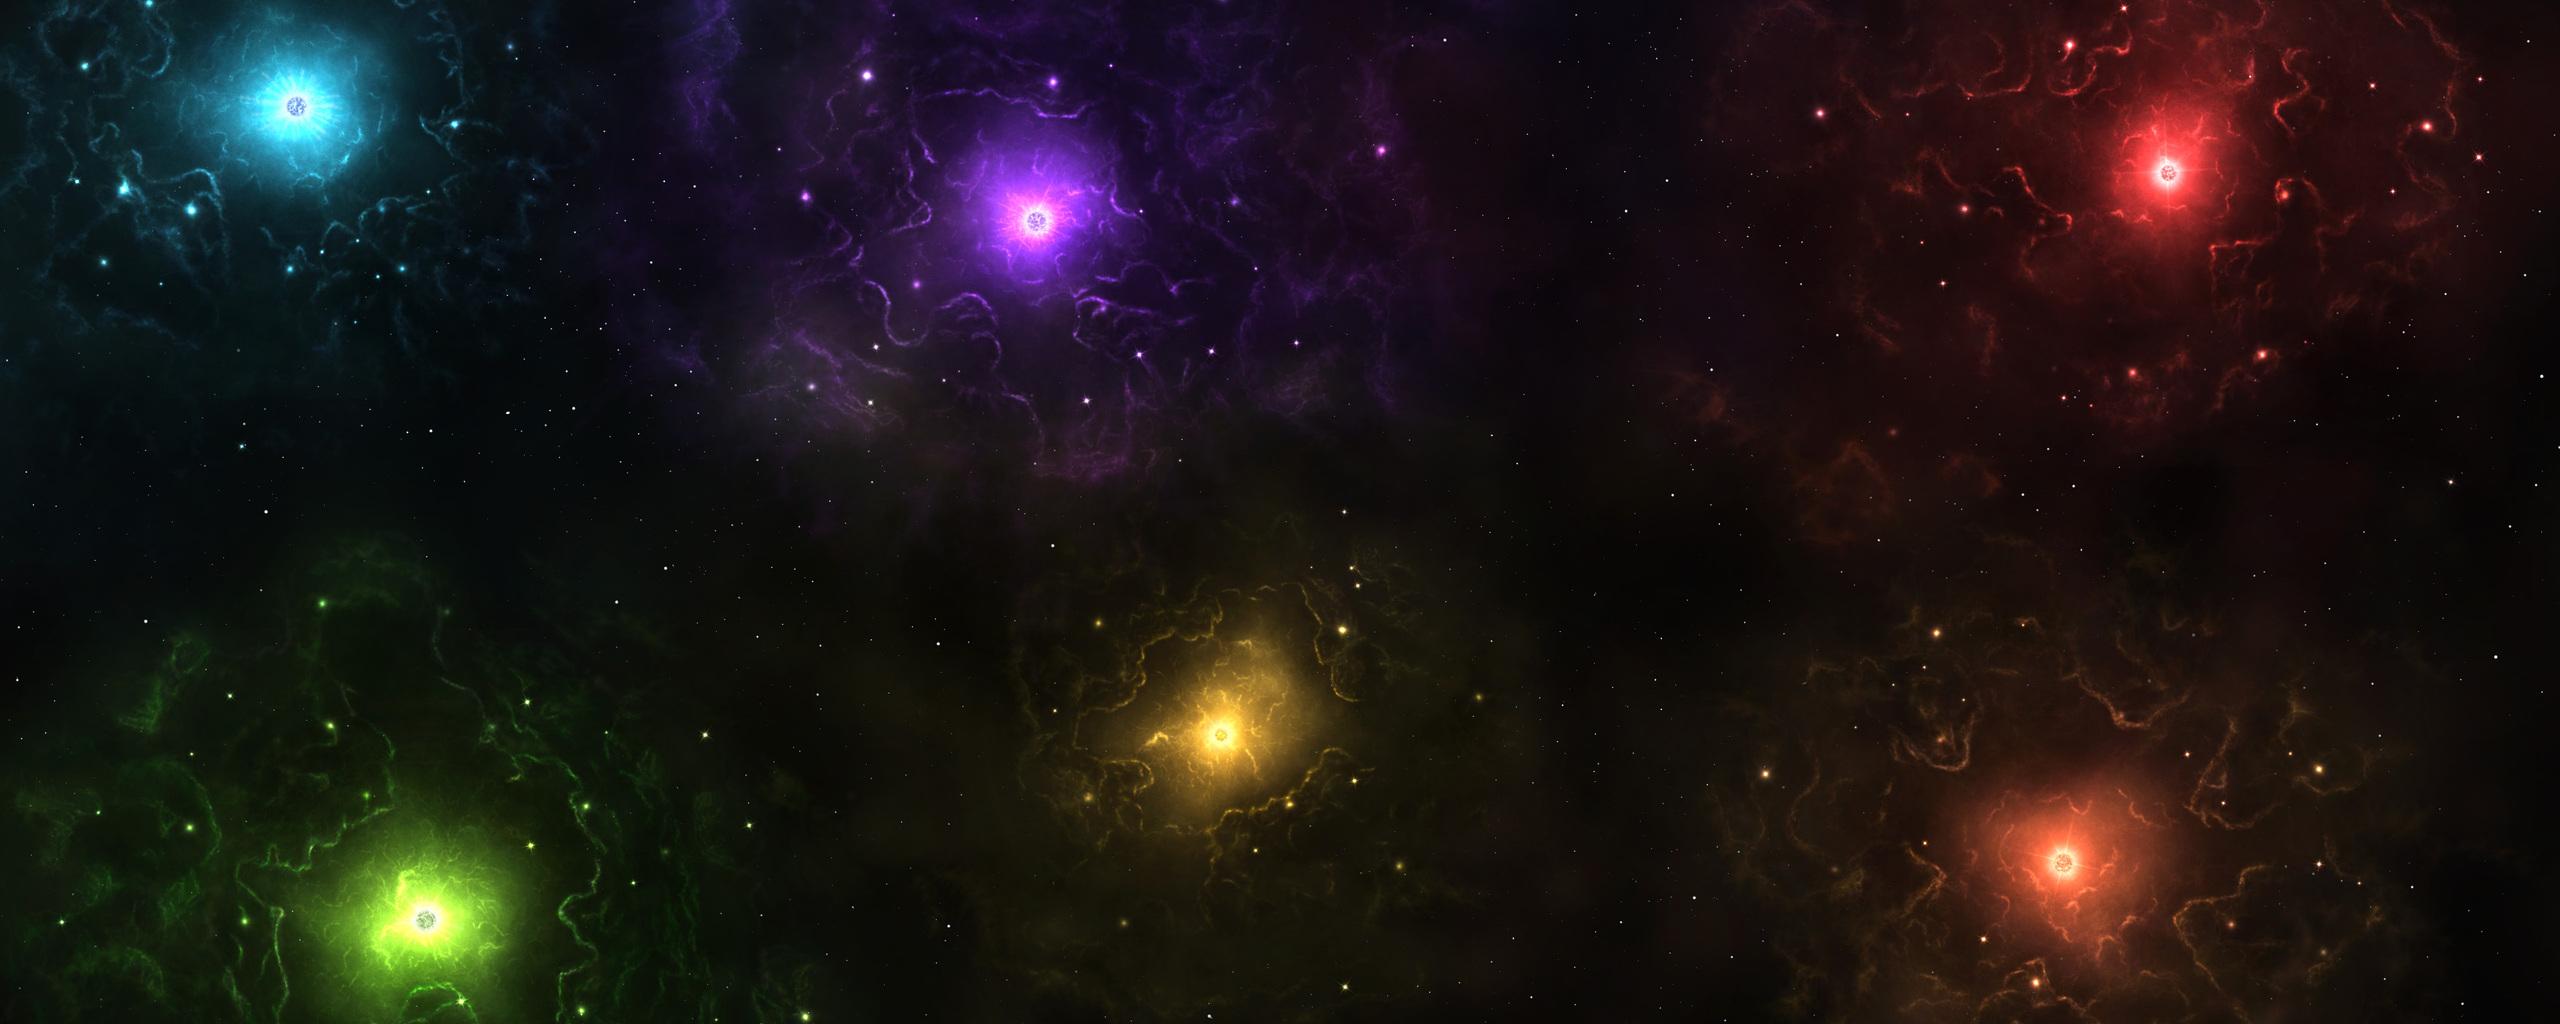 infinity-constellation-4k-9g.jpg